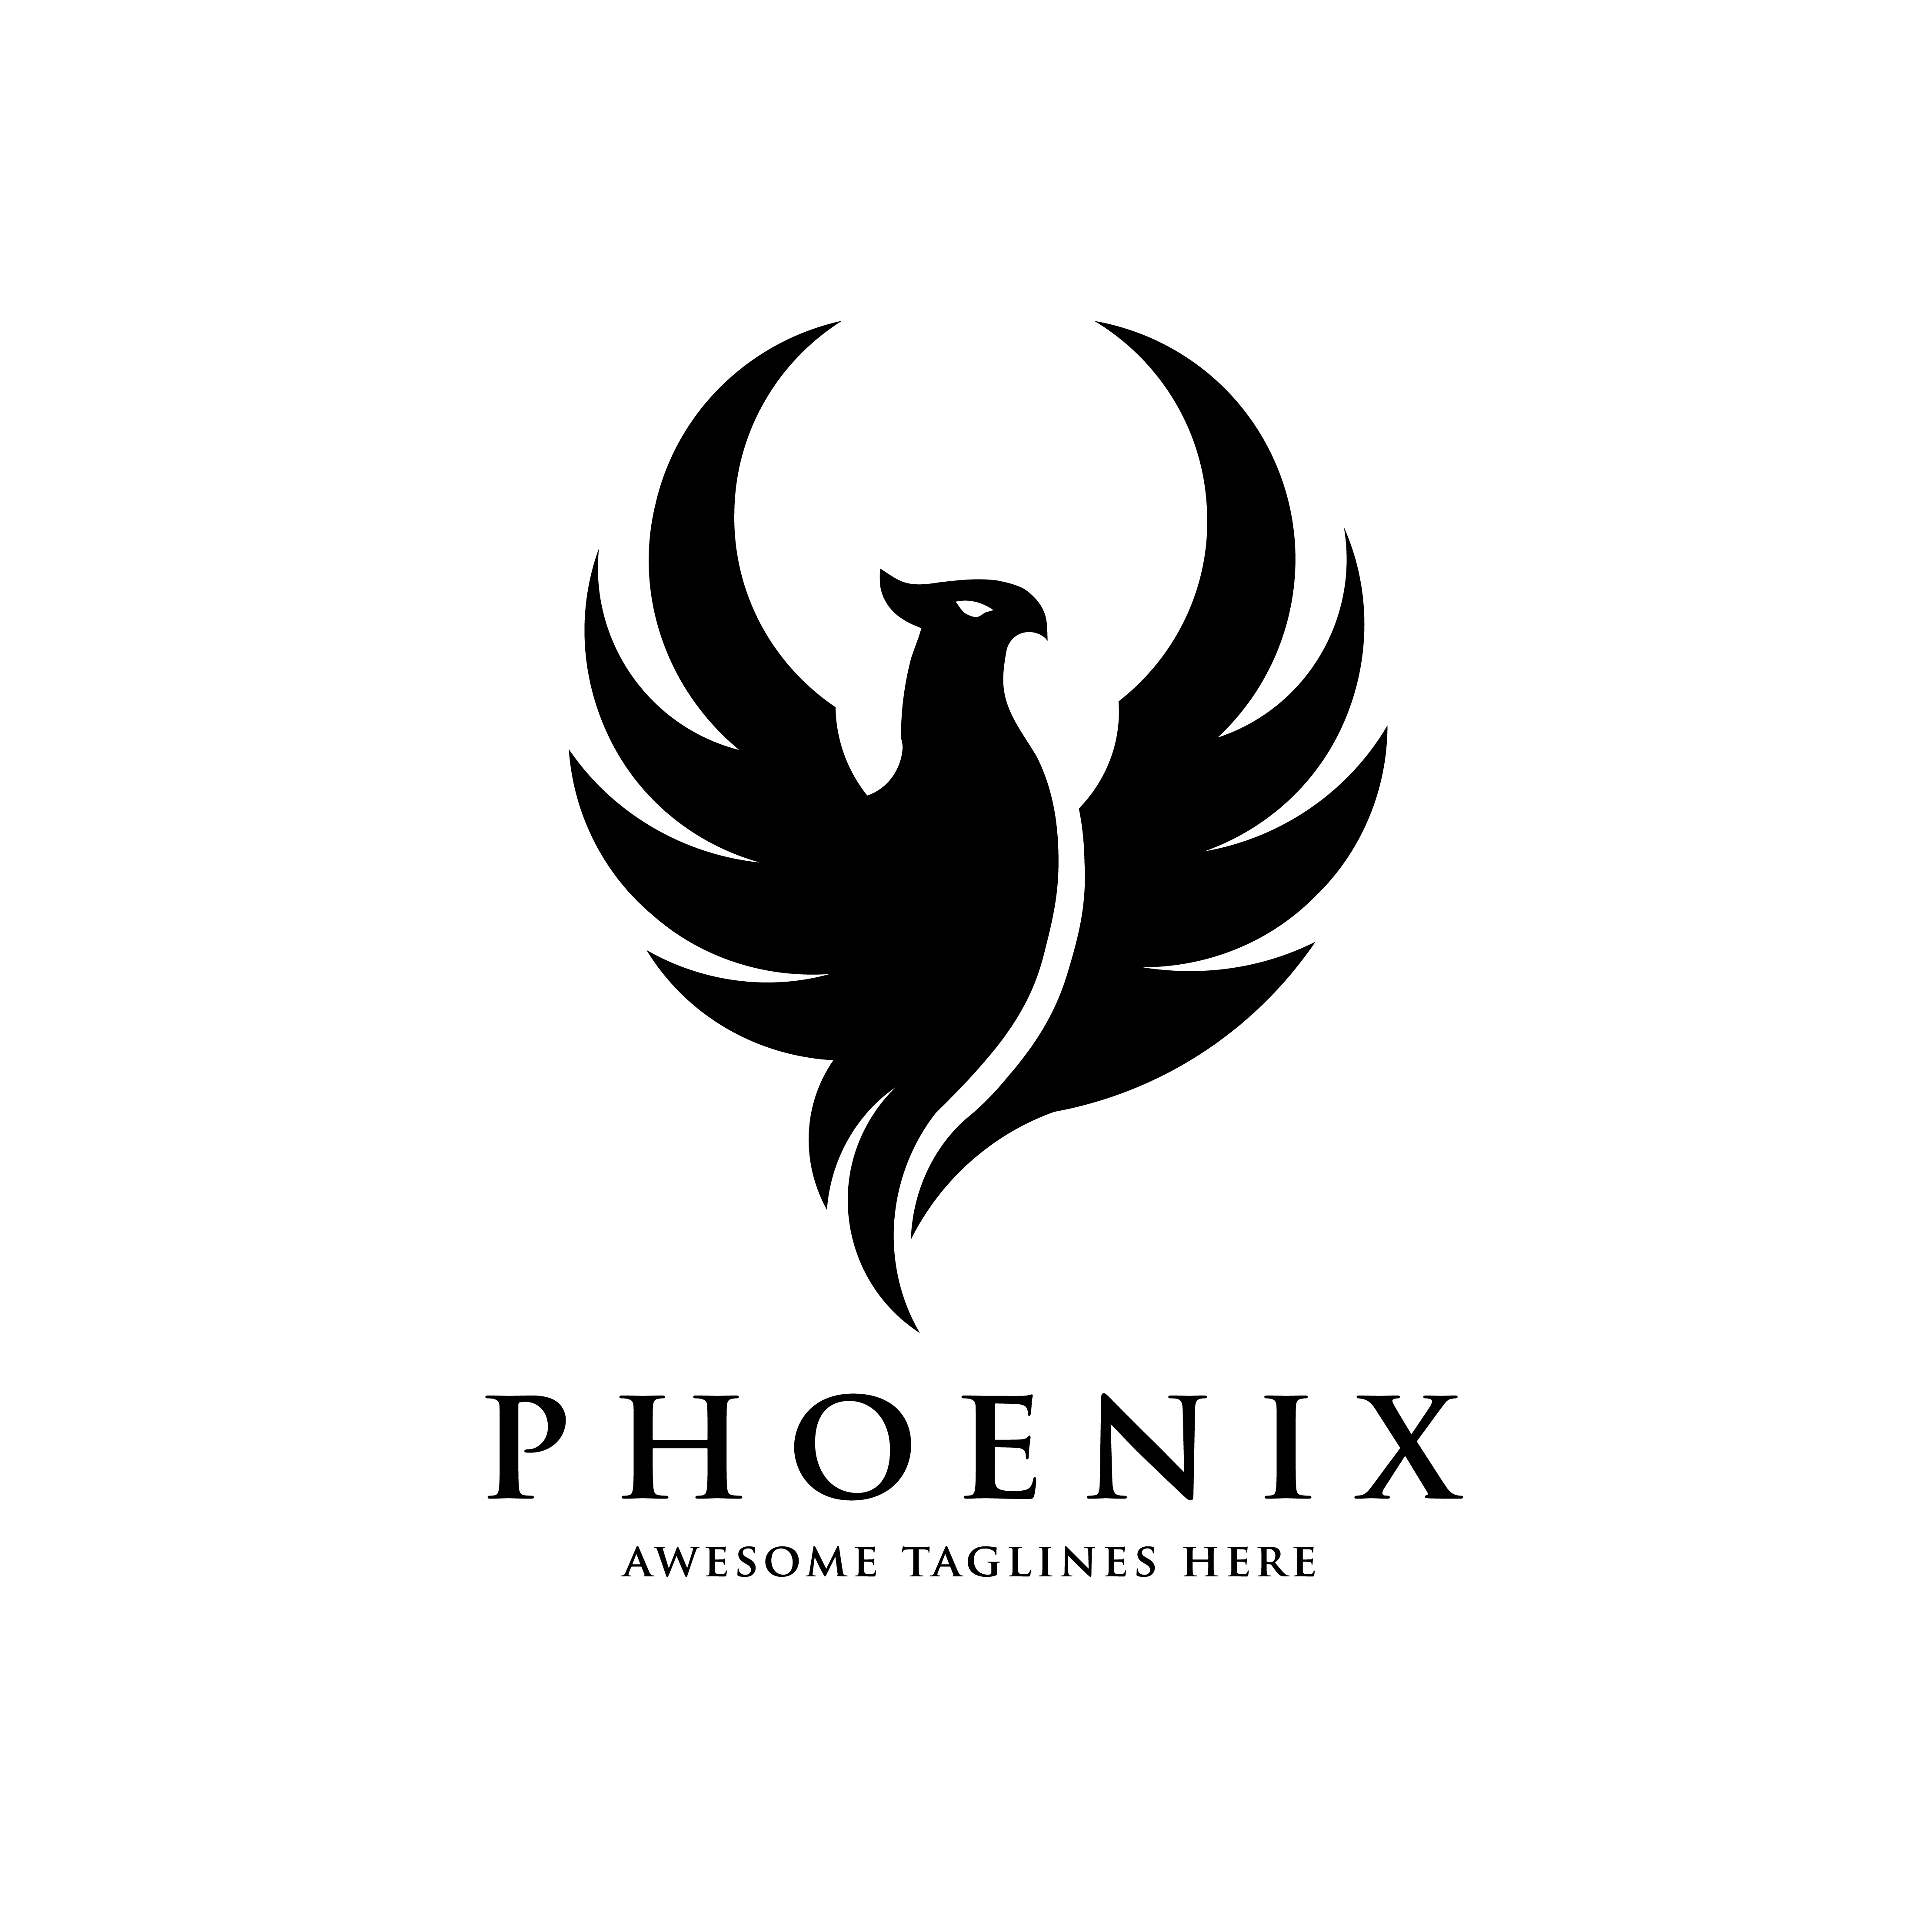 vector-phoenix-bird-logo-concept Letter Template On Head on acenda health, trellis company, professional media, academy hospitality tourism, my family twitter, it department,